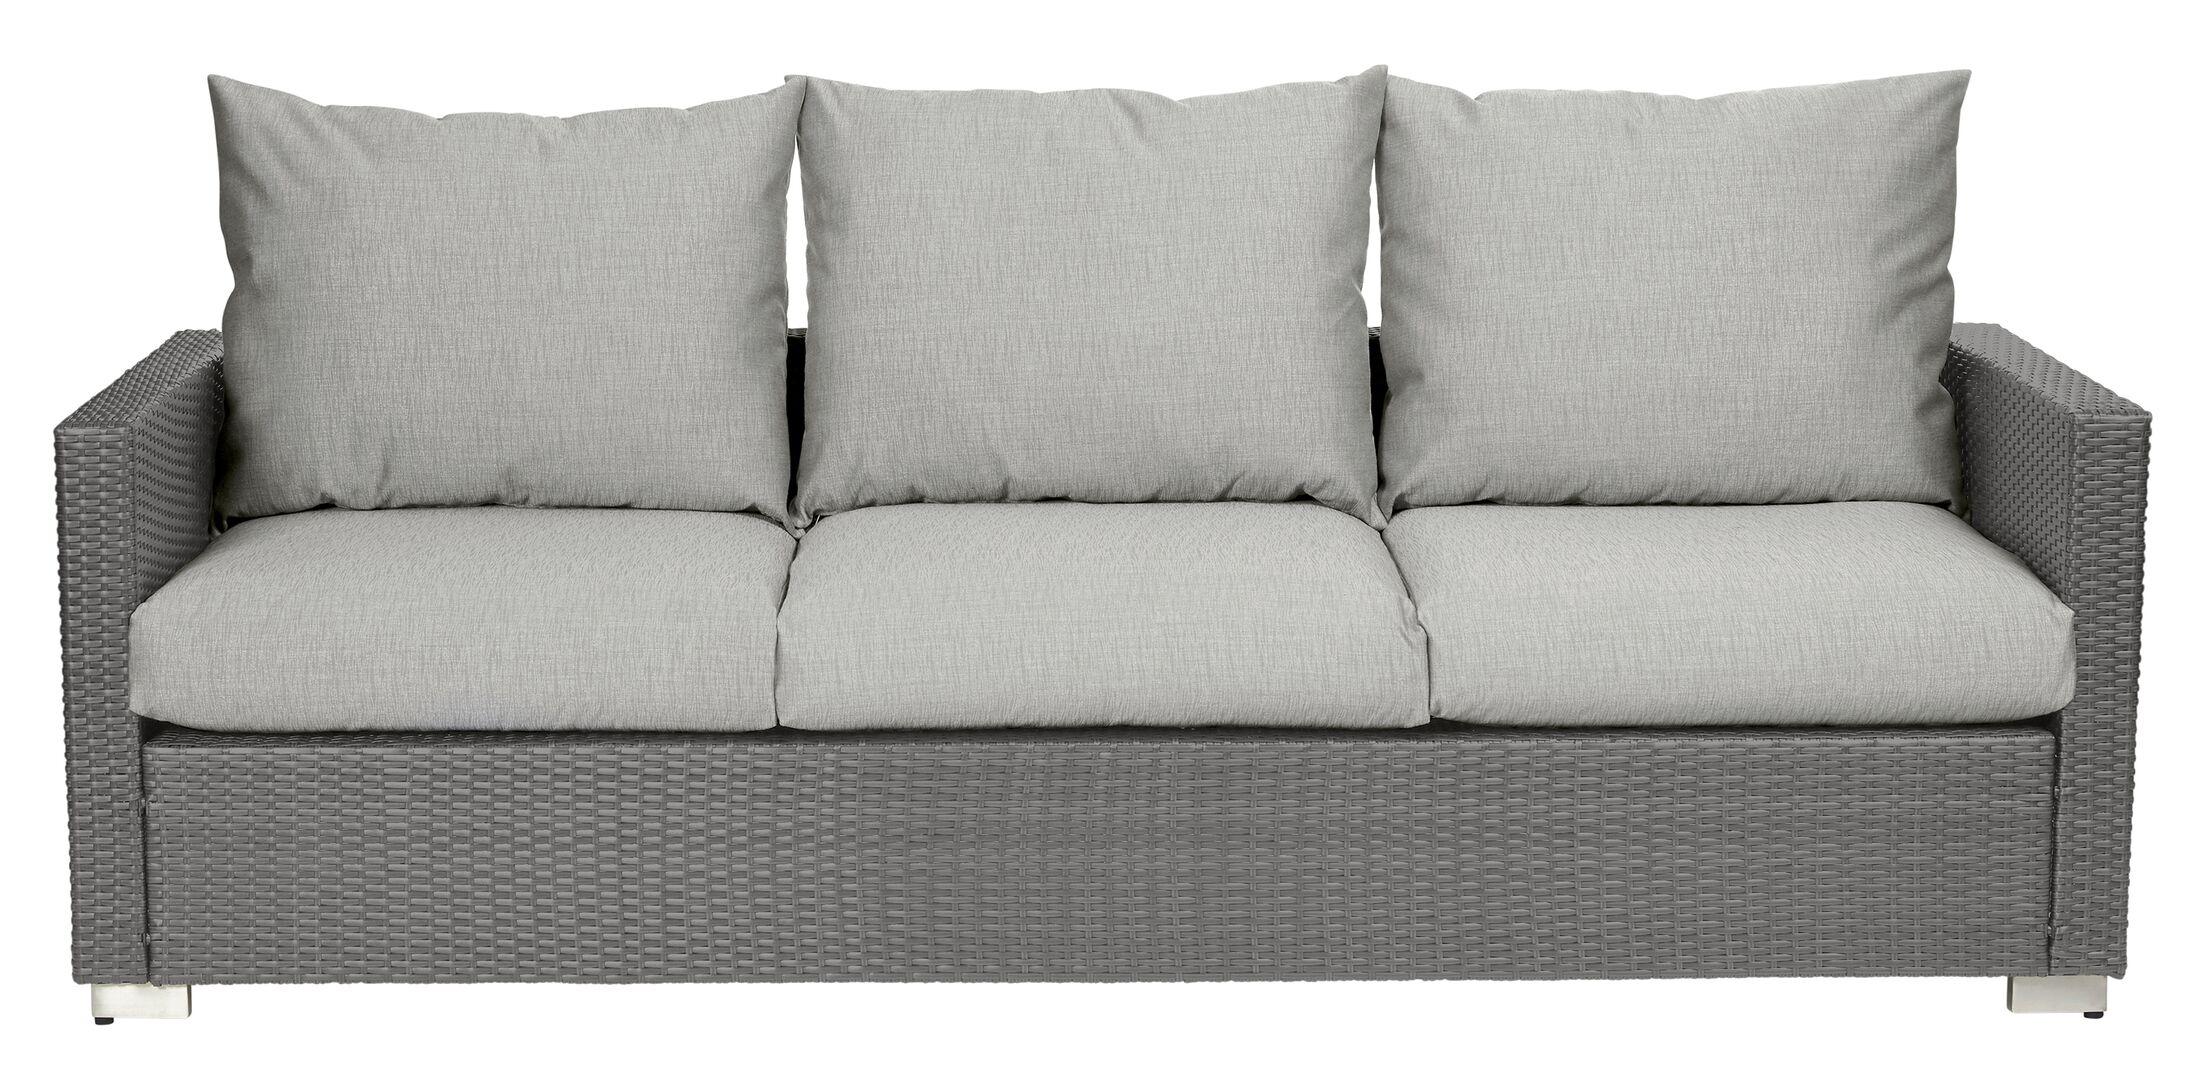 Mcmanis Patio Sofa with Cushion Cushion Color: Taupe, Frame Color: Smoke Gray